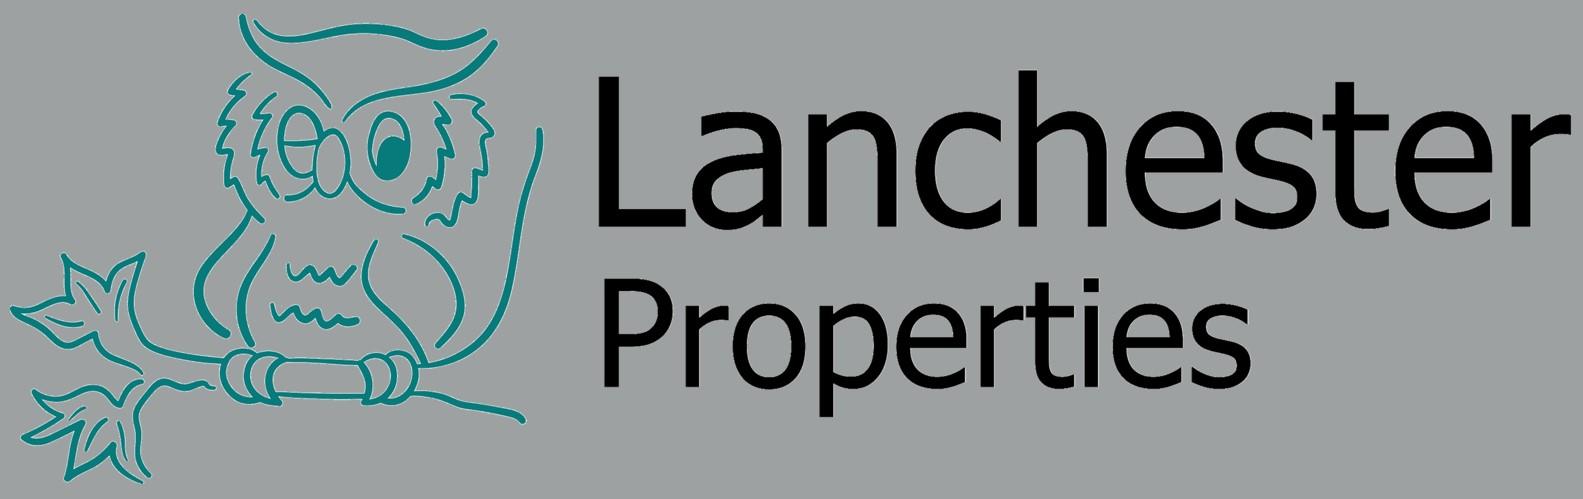 Image: Lanchester Properties